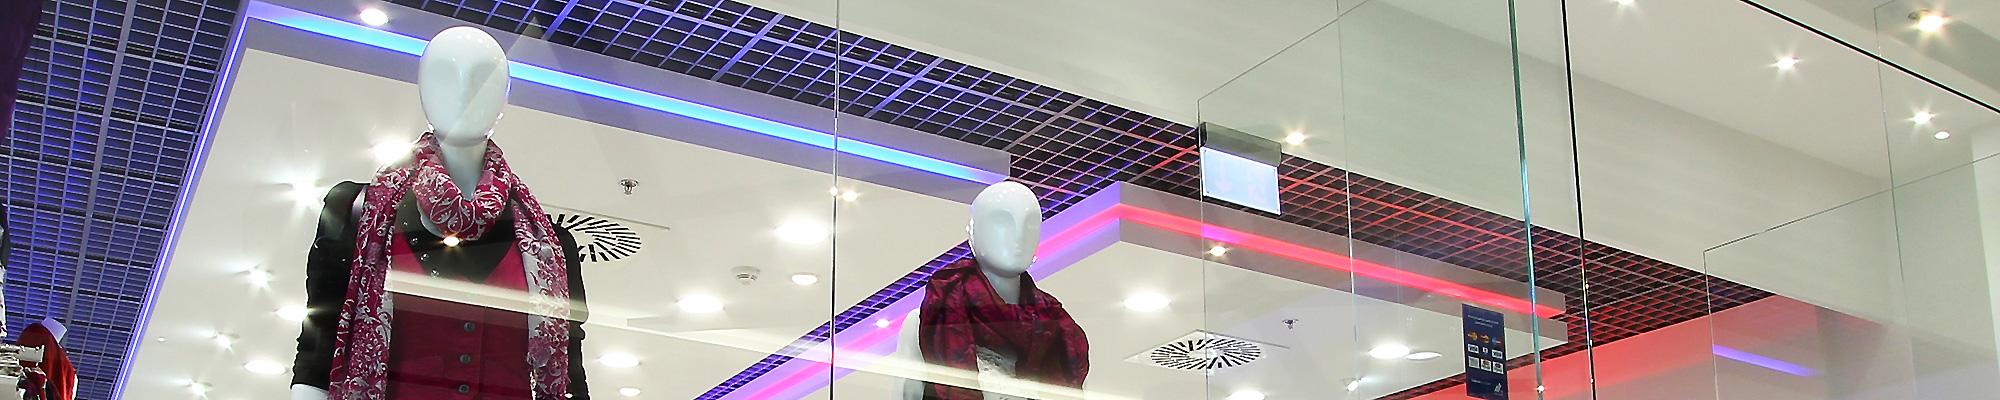 LED_obchod_1